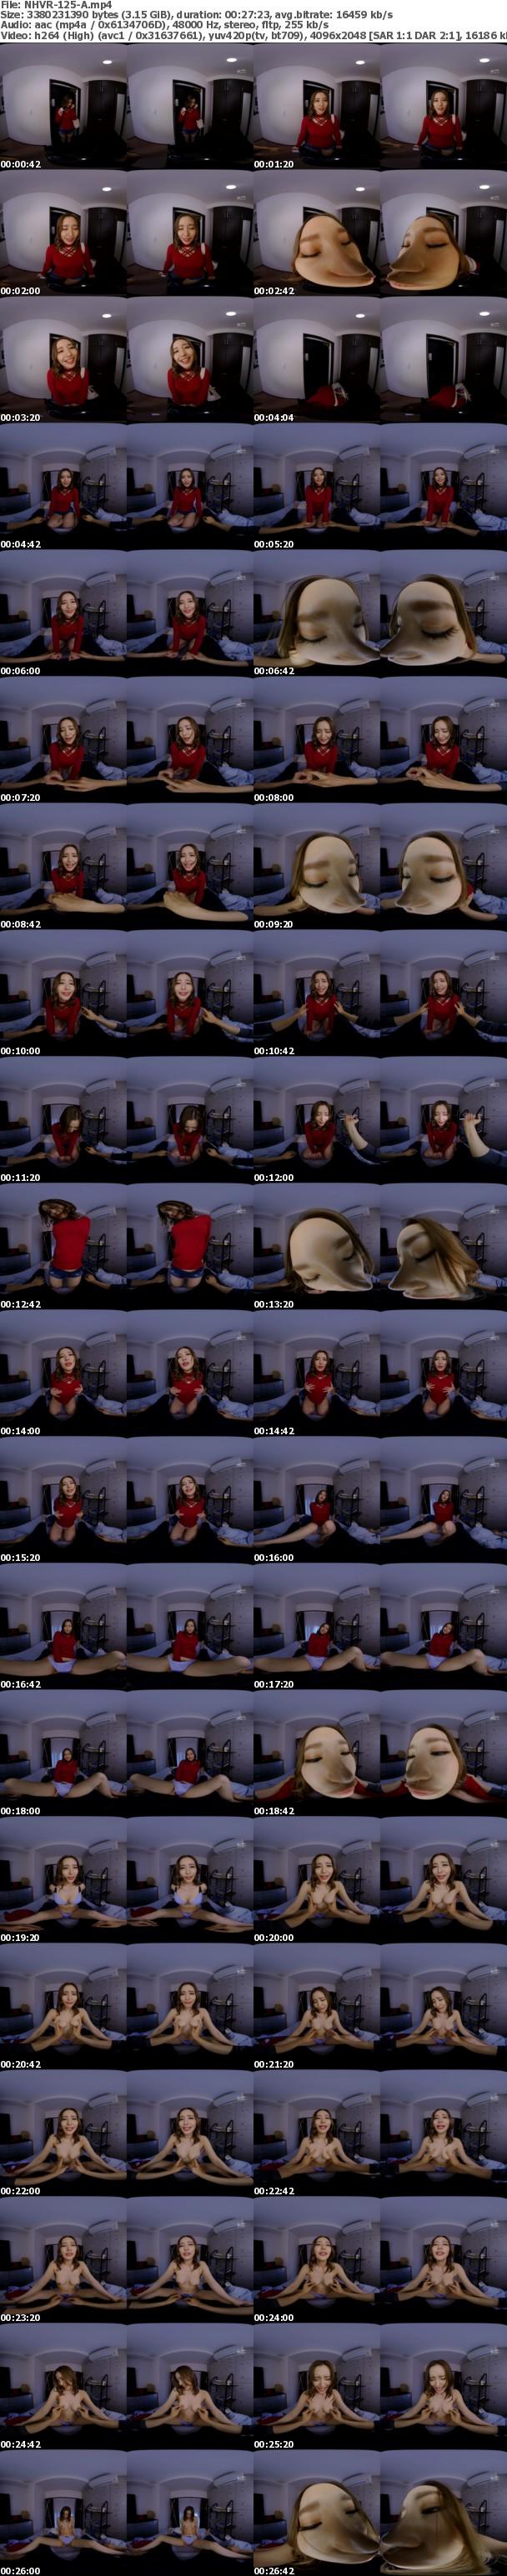 (VR) NHVR-125 催●術で脈なしギャルが俺にデレデレべろ舐め奉仕 キスするたびに好きになる恋愛指示洗脳SEXで完全支配